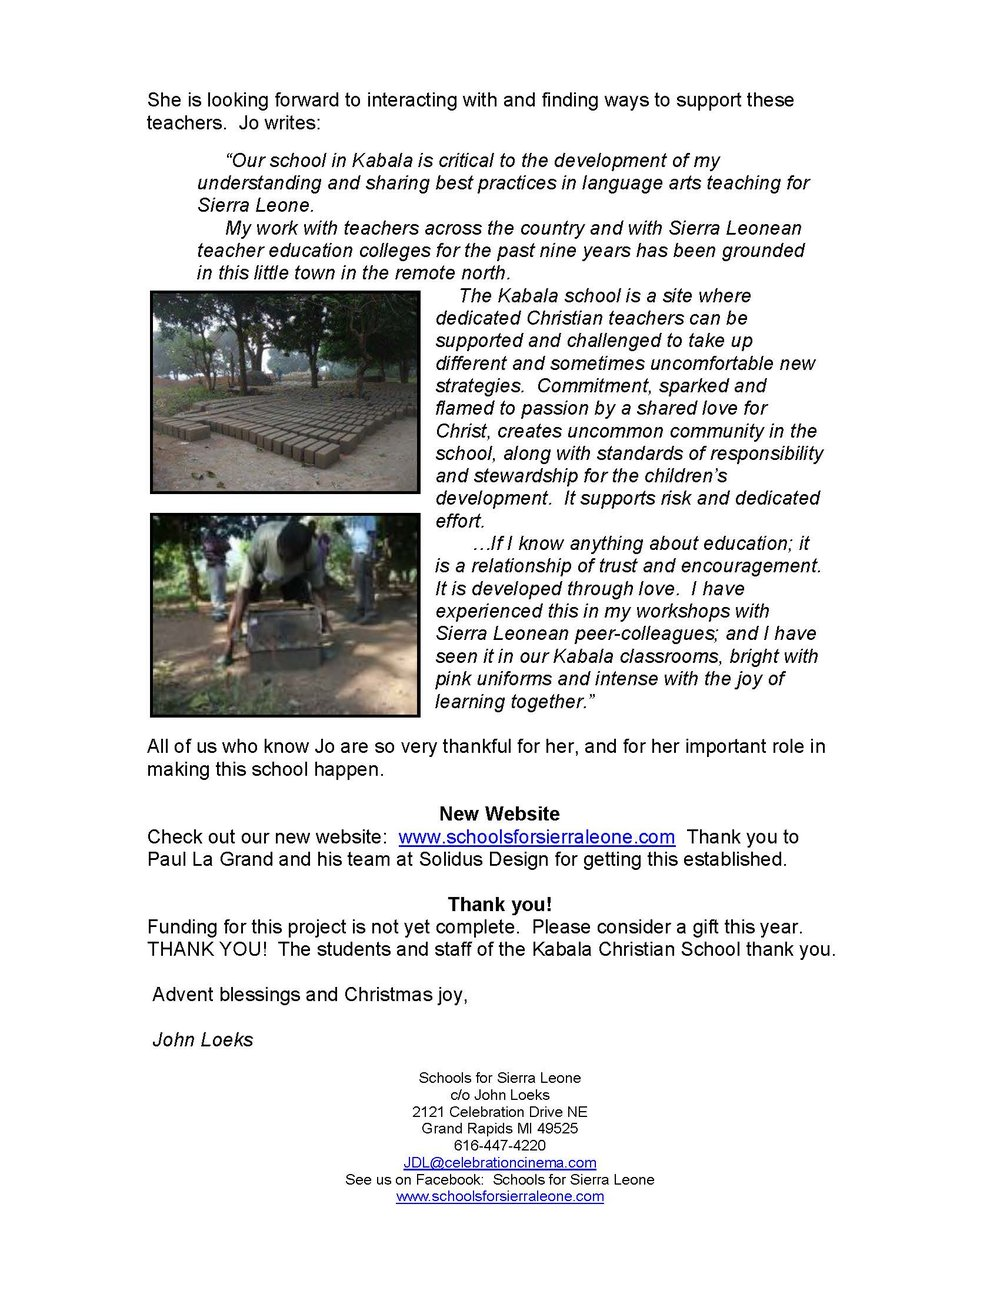 Schools for Sierra Leone Newsletter 12-10_Page_2.jpg